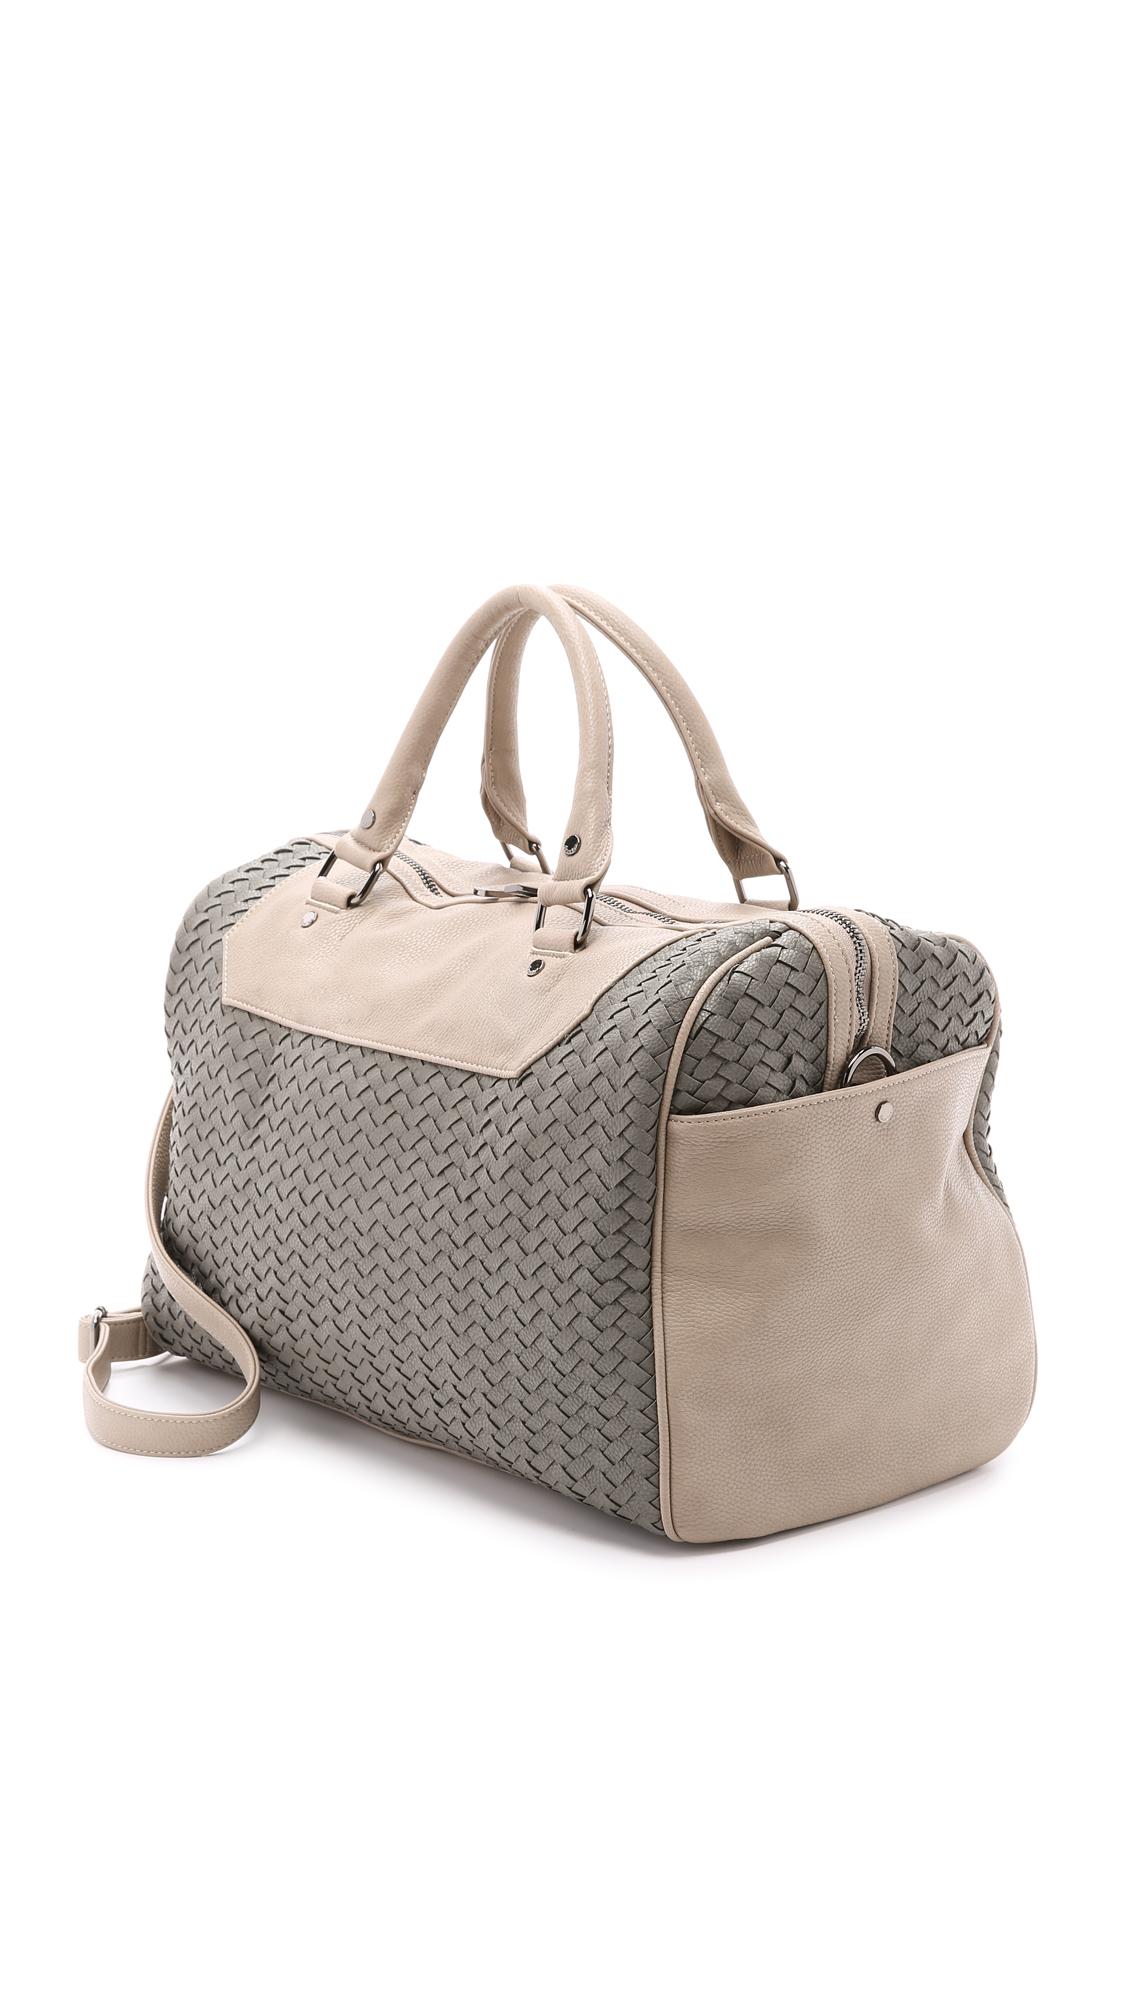 Deux Lux Lexington Weekender Bag Grey In Gray Lyst